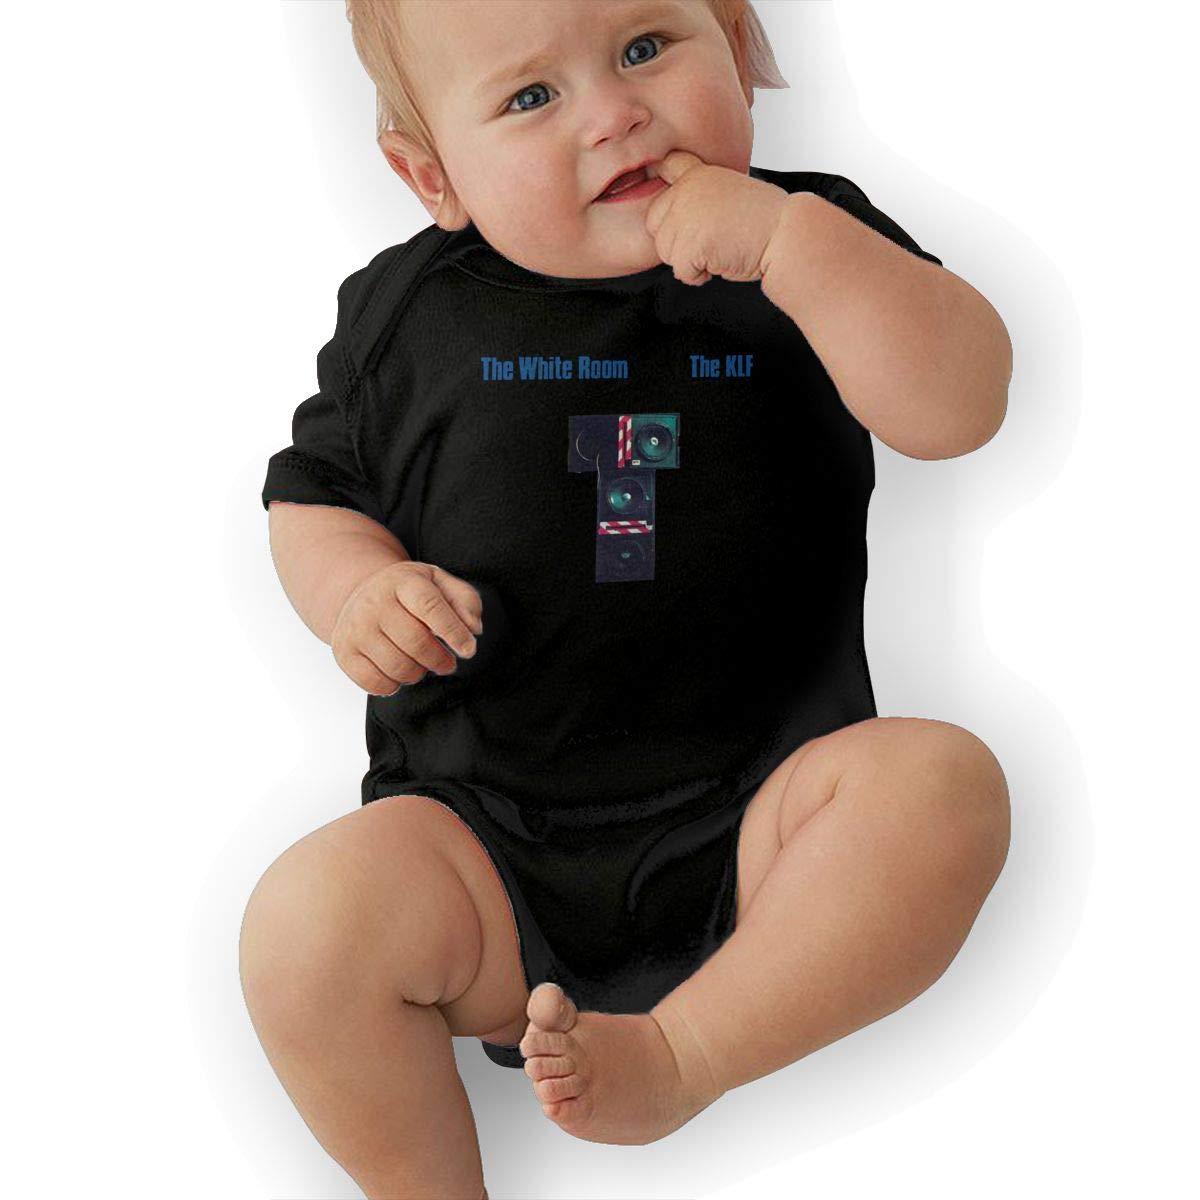 LuckyTagy The KLF The White Room Unisex Classic Newborn Baby Romper Baby GirlPlaysuit Black